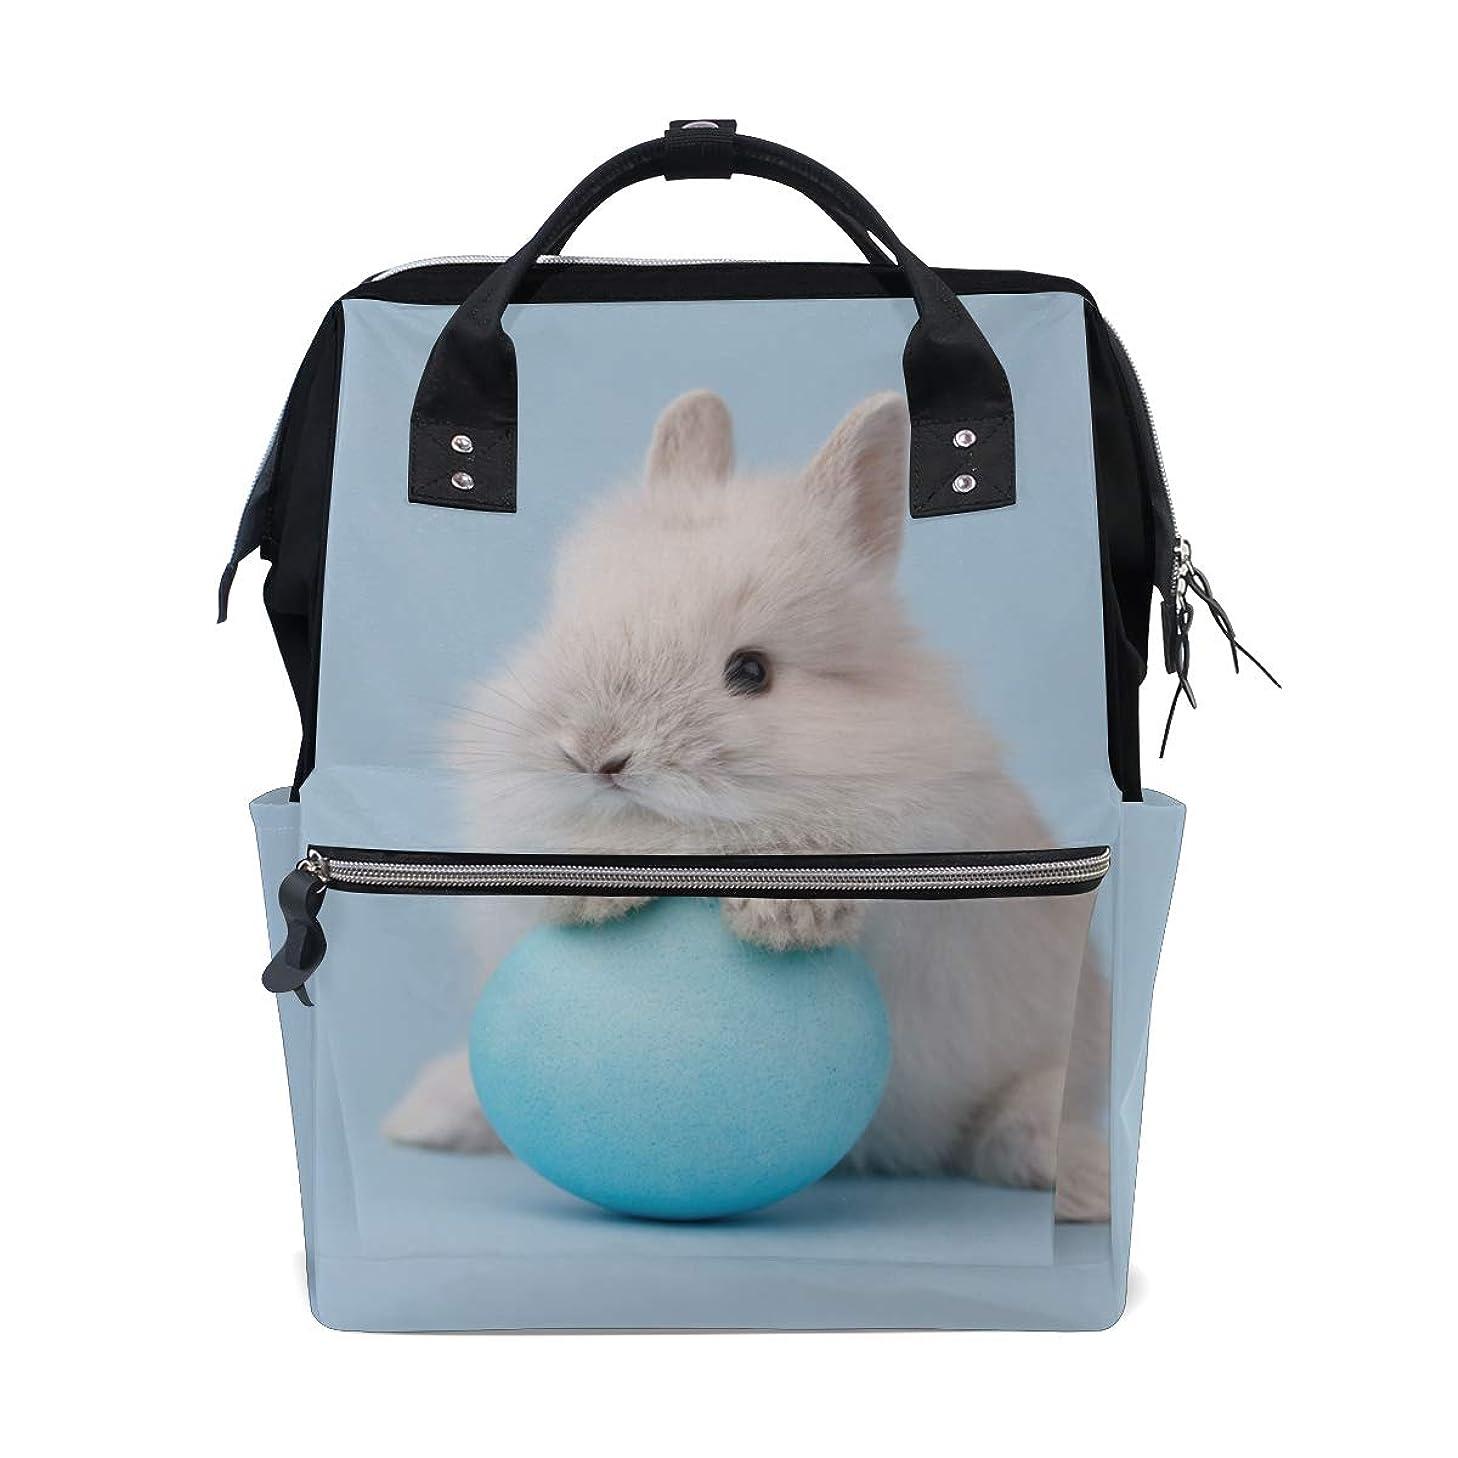 Cute Rabbit With Blue Easter Egg School Backpack Large Capacity Mummy Bags Laptop Handbag Casual Travel Rucksack Satchel For Women Men Adult Teen Children